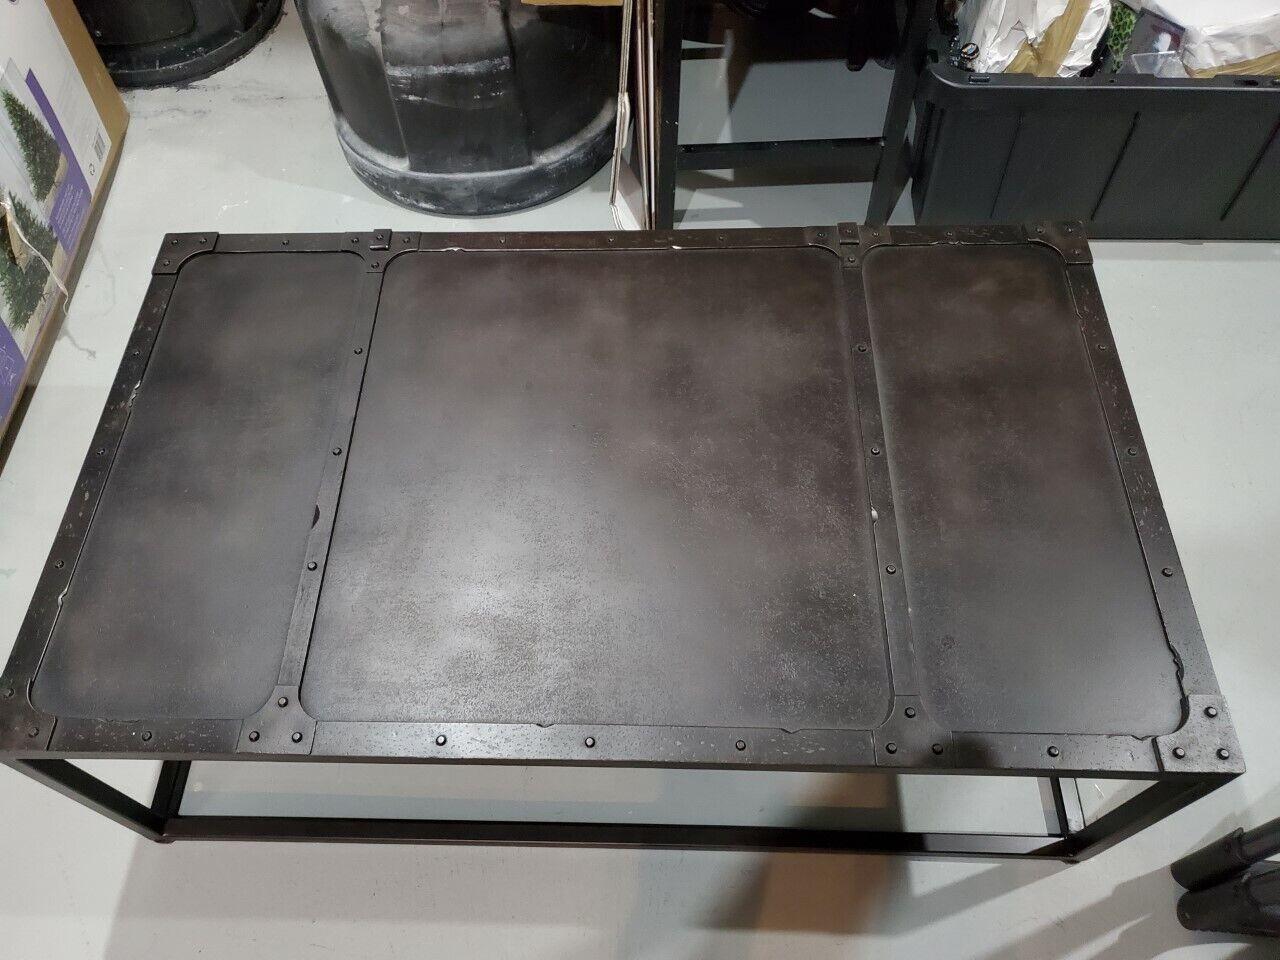 Restoration Hardware Medium Rectangle Marble Plinth Coffee Table White For Sale Online Ebay